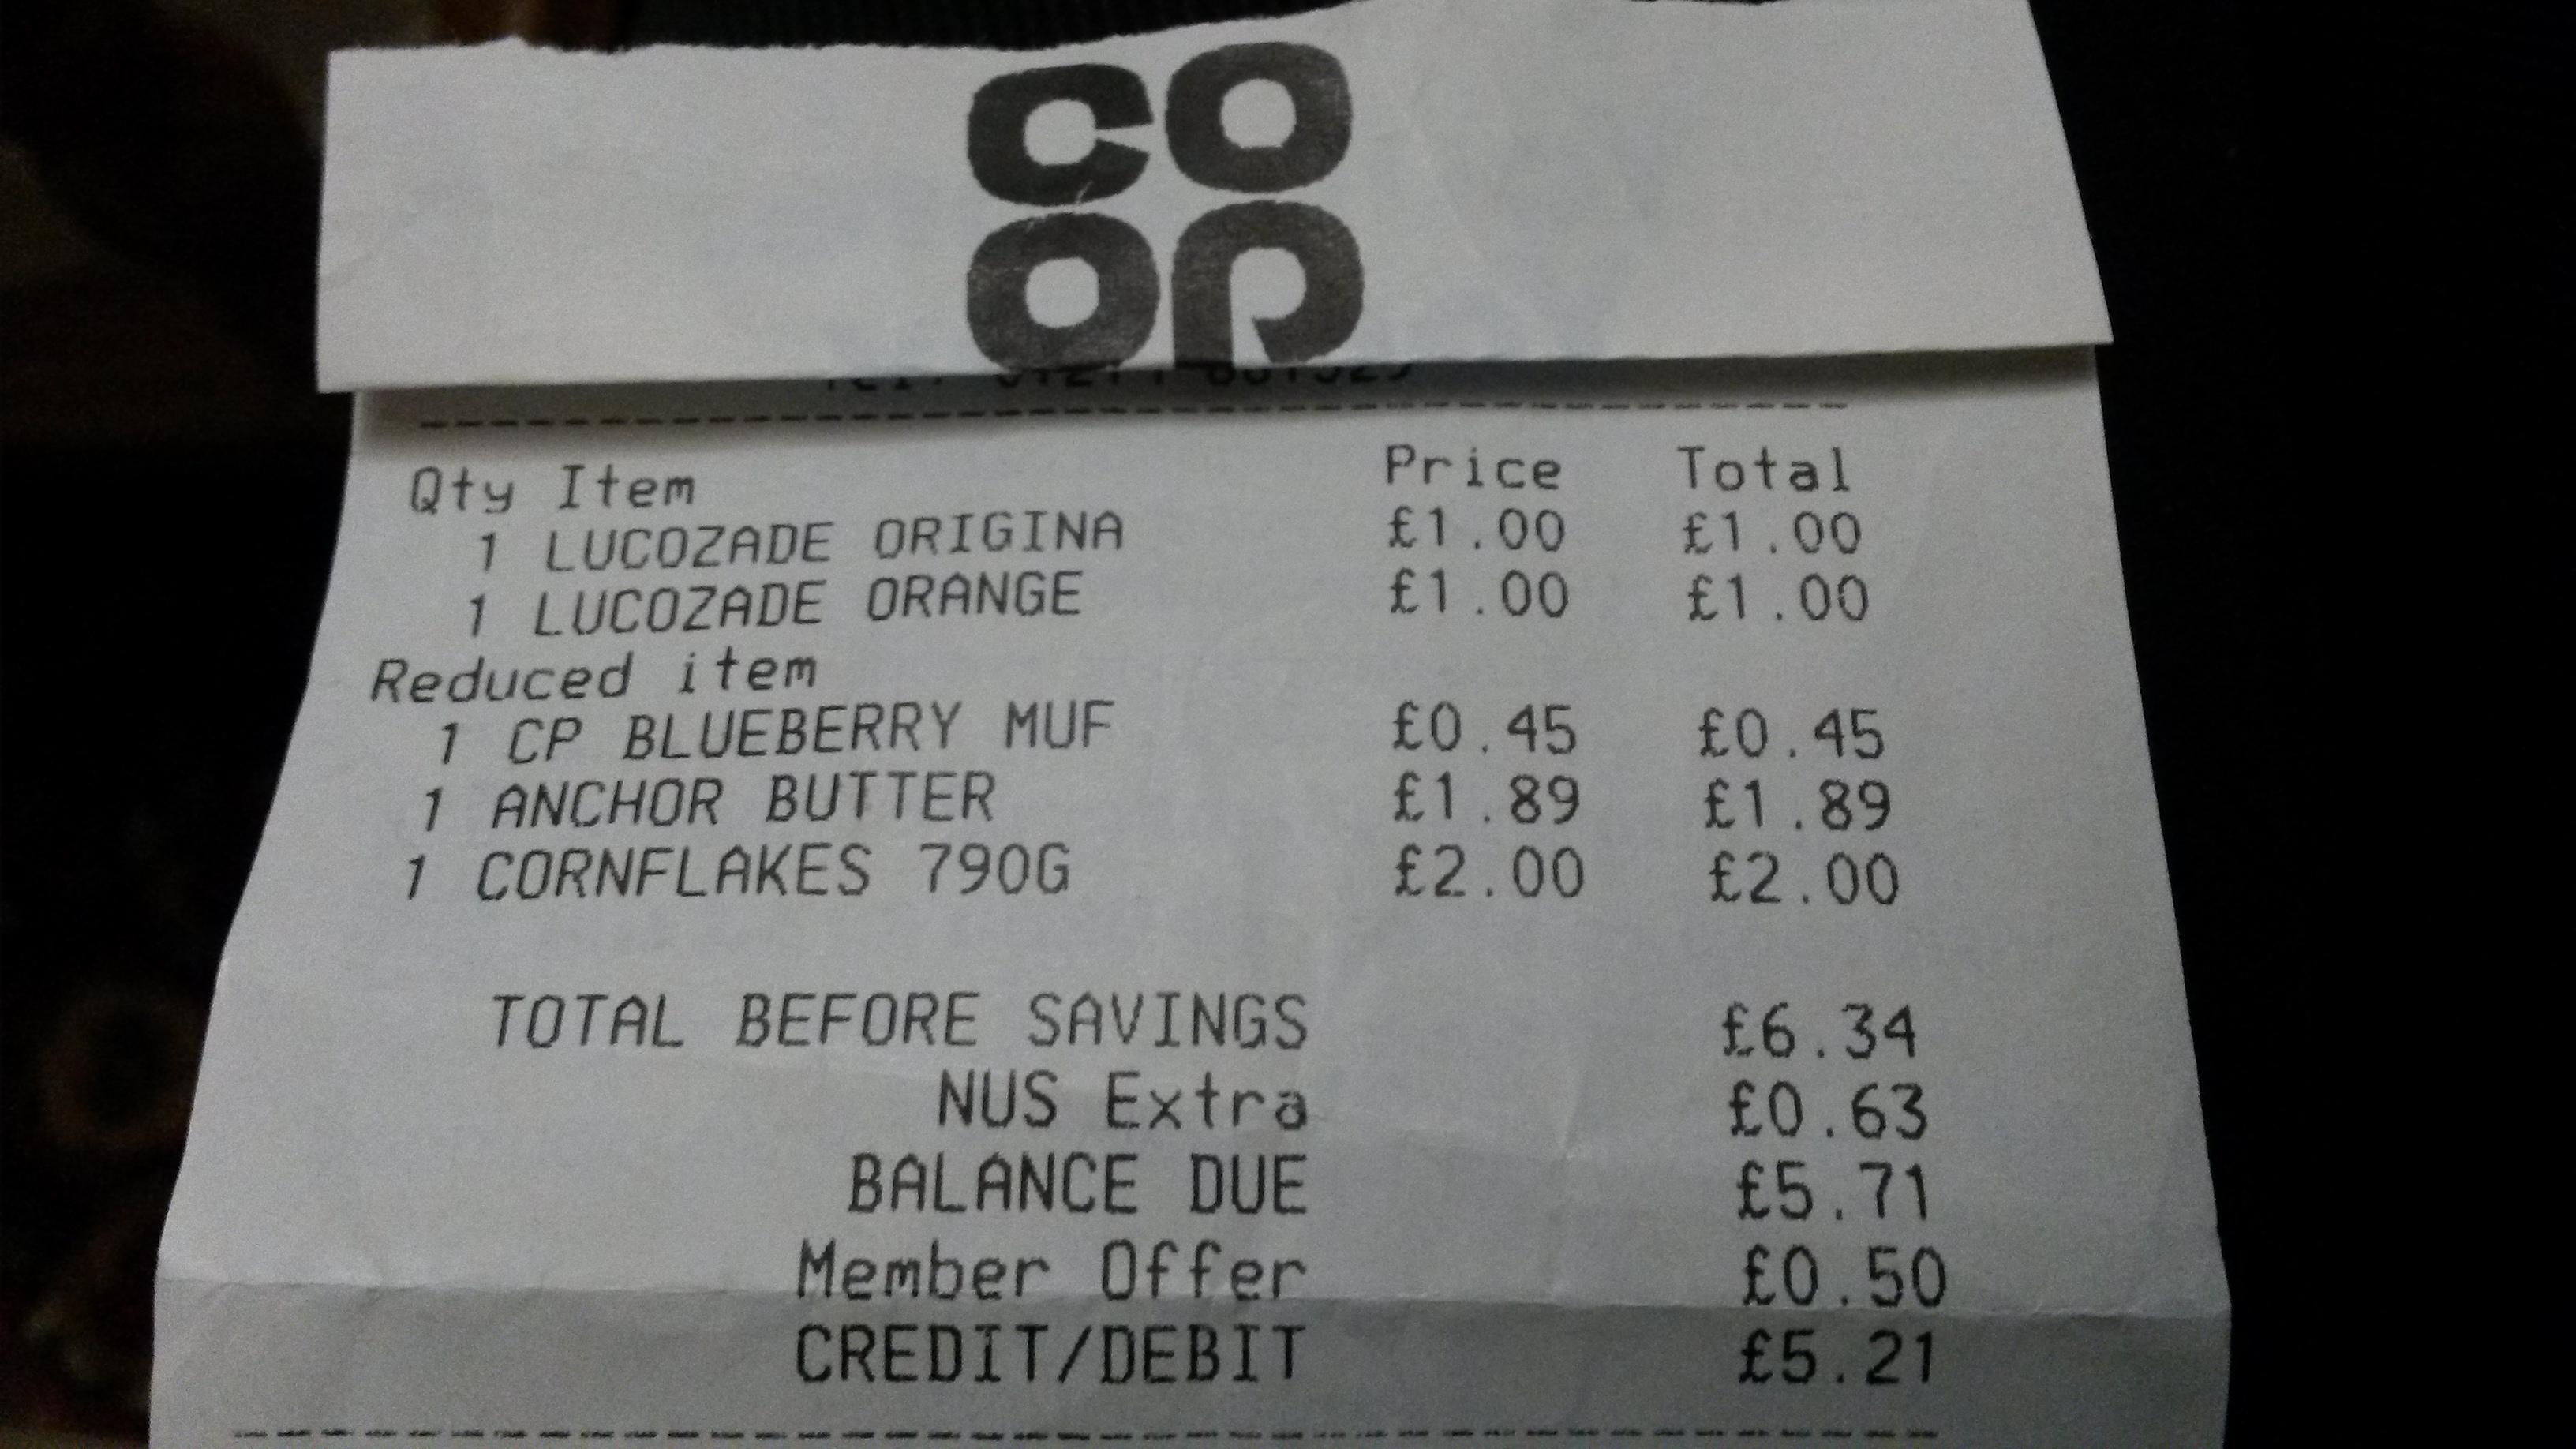 Kelloggs Cornflakes 790g £2 instore @ CoOp